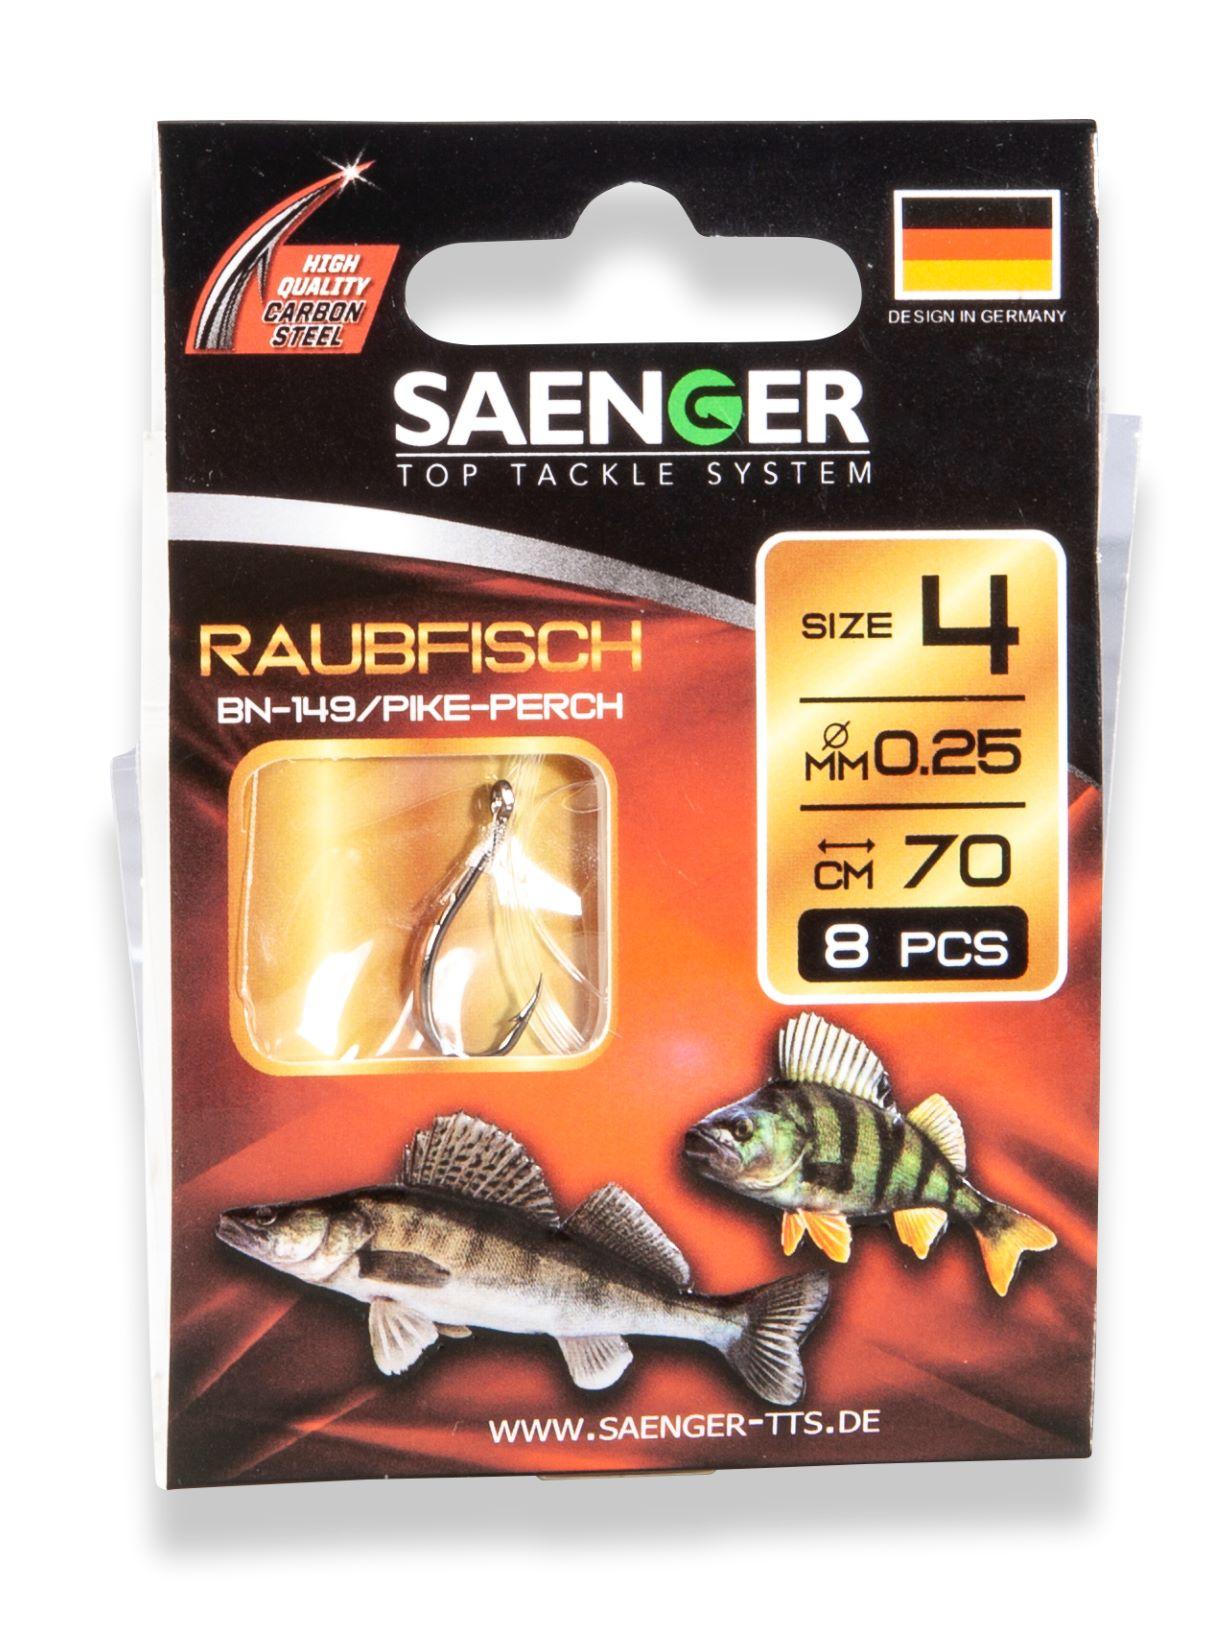 Saenger Návazec na chytání dravých ryb Raubfisch vel. 2/0, 8 ks/bal